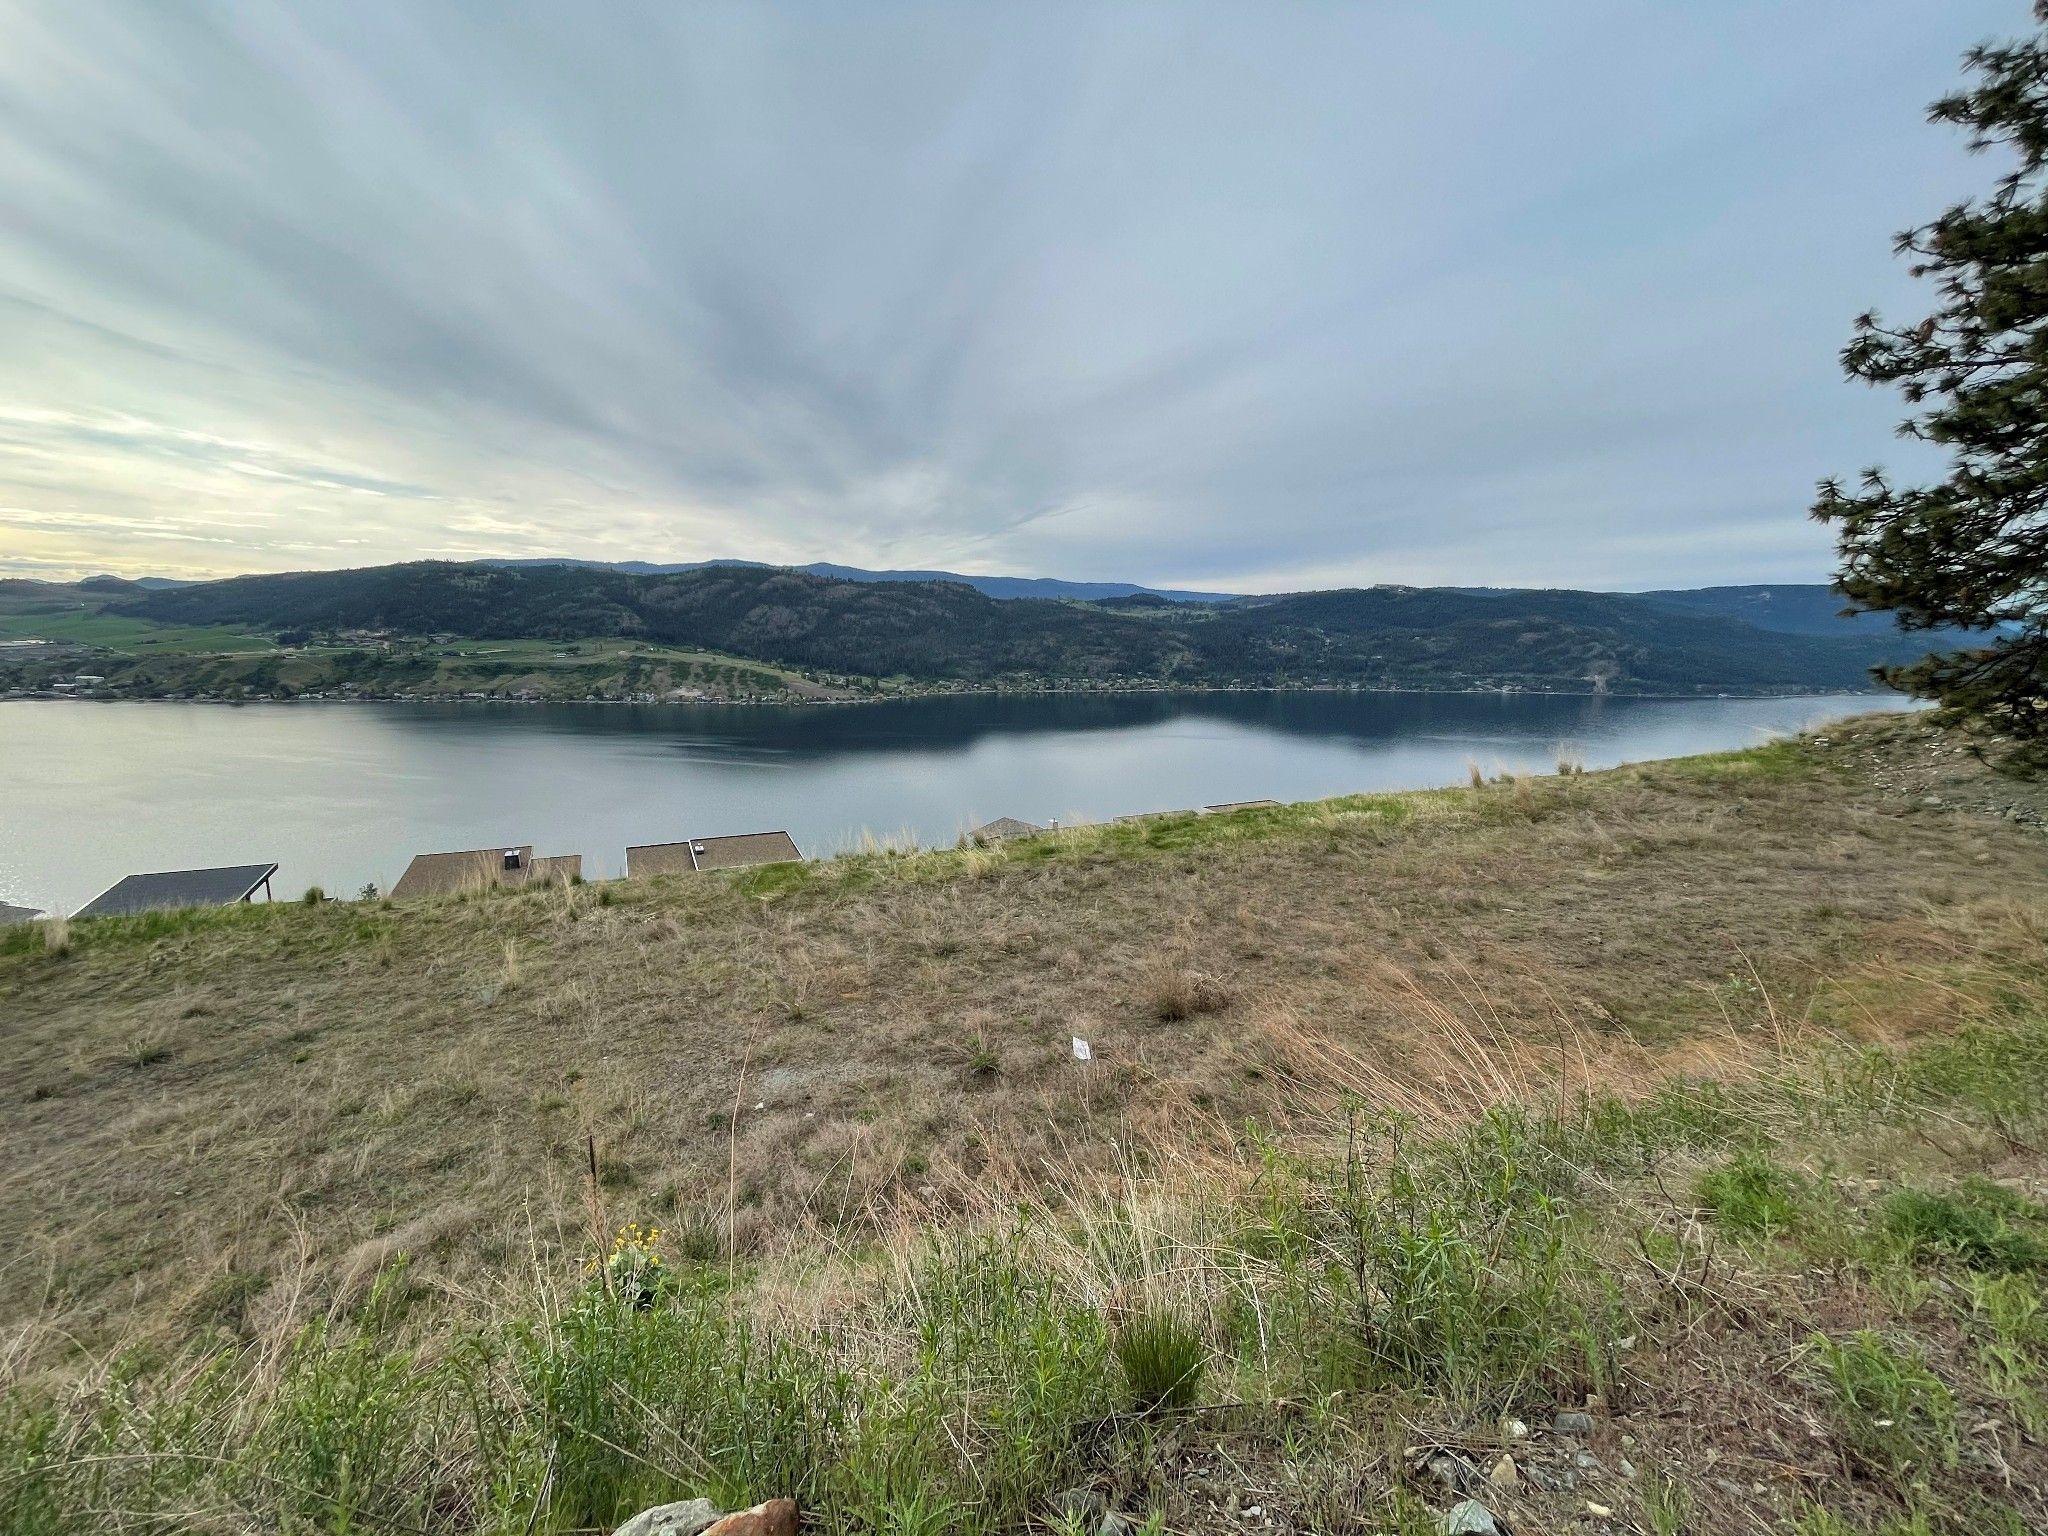 Main Photo: 8912-8948 Tavistock Road in Vernon: Adventure Bay Vacant Land for sale (North Okanagan)  : MLS®# 10228765